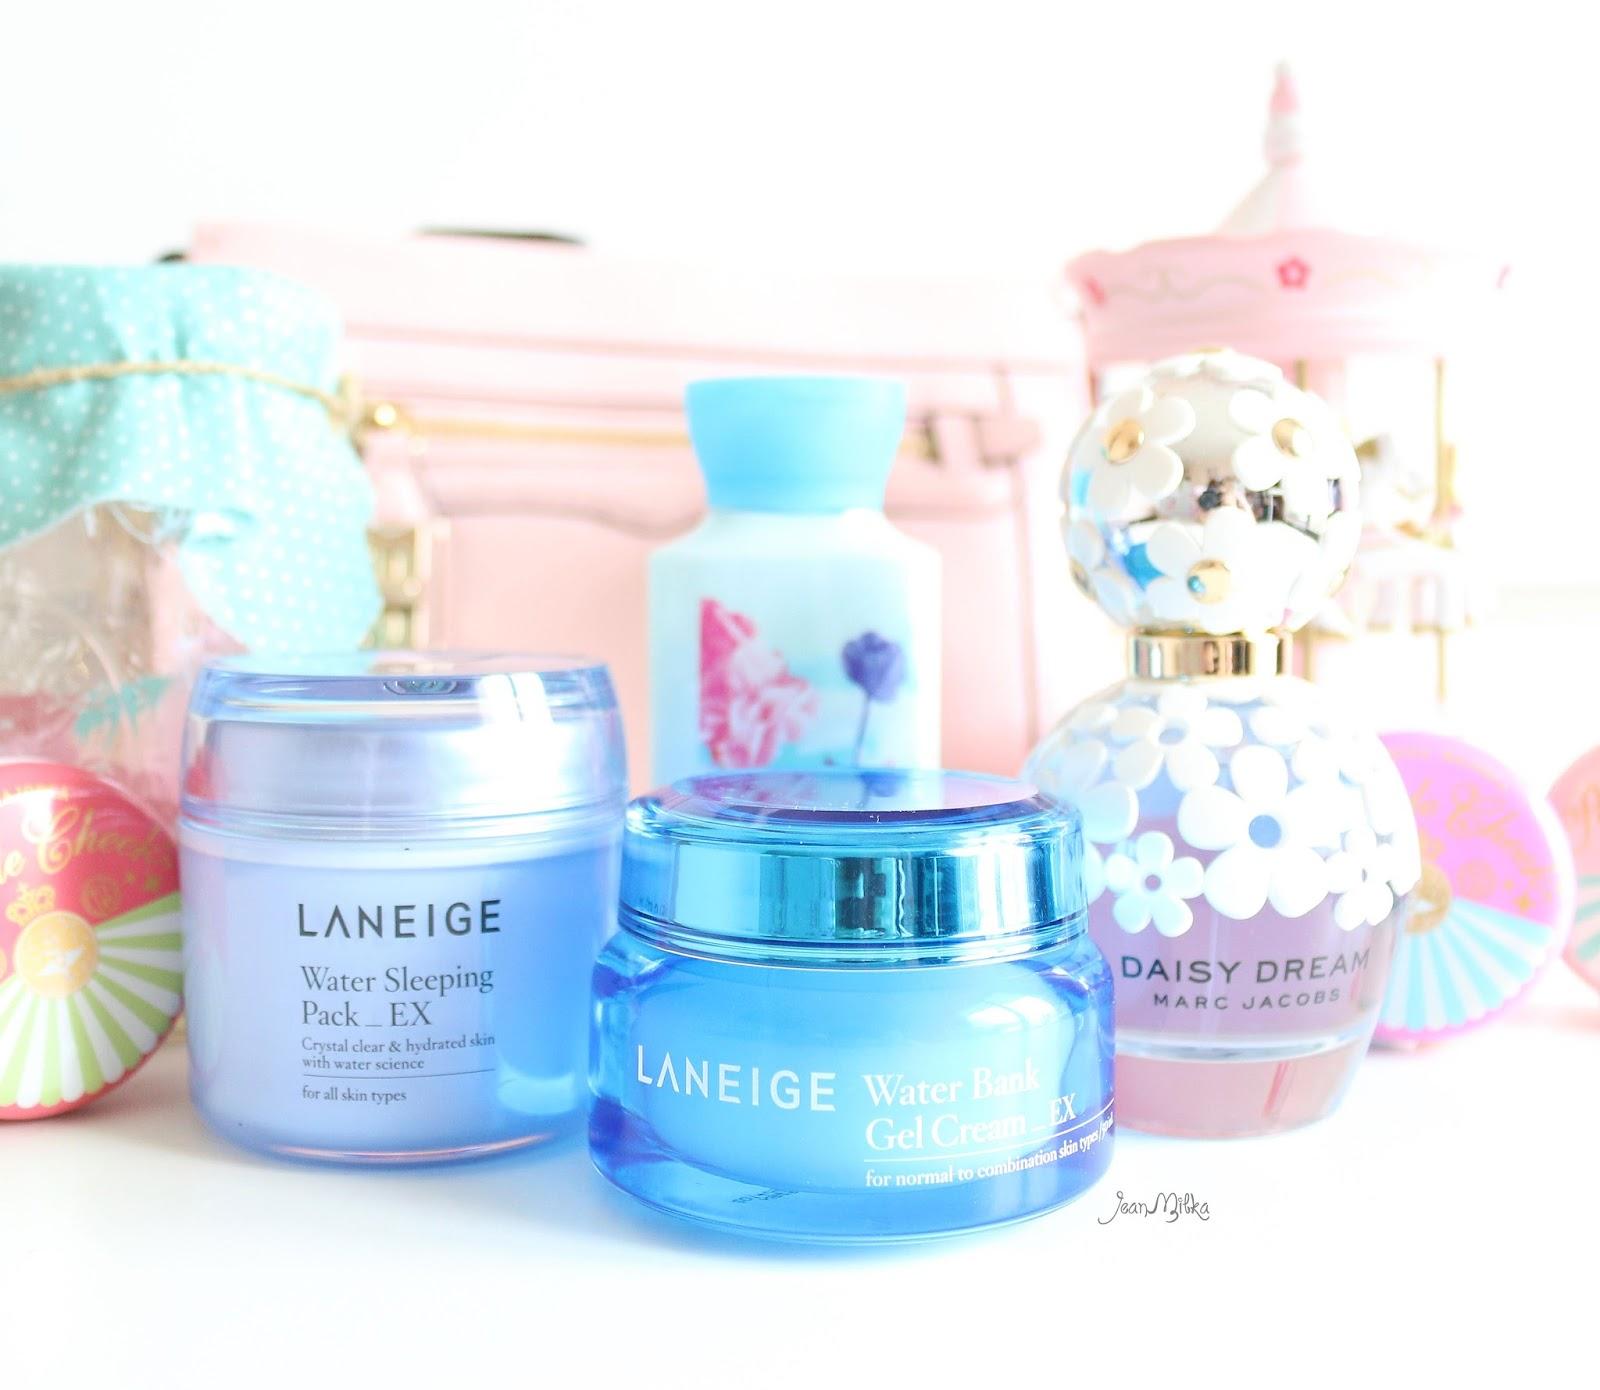 laneige, water bank, gel cream, oily skin, laneige water bank, skin care, review, moisturizer